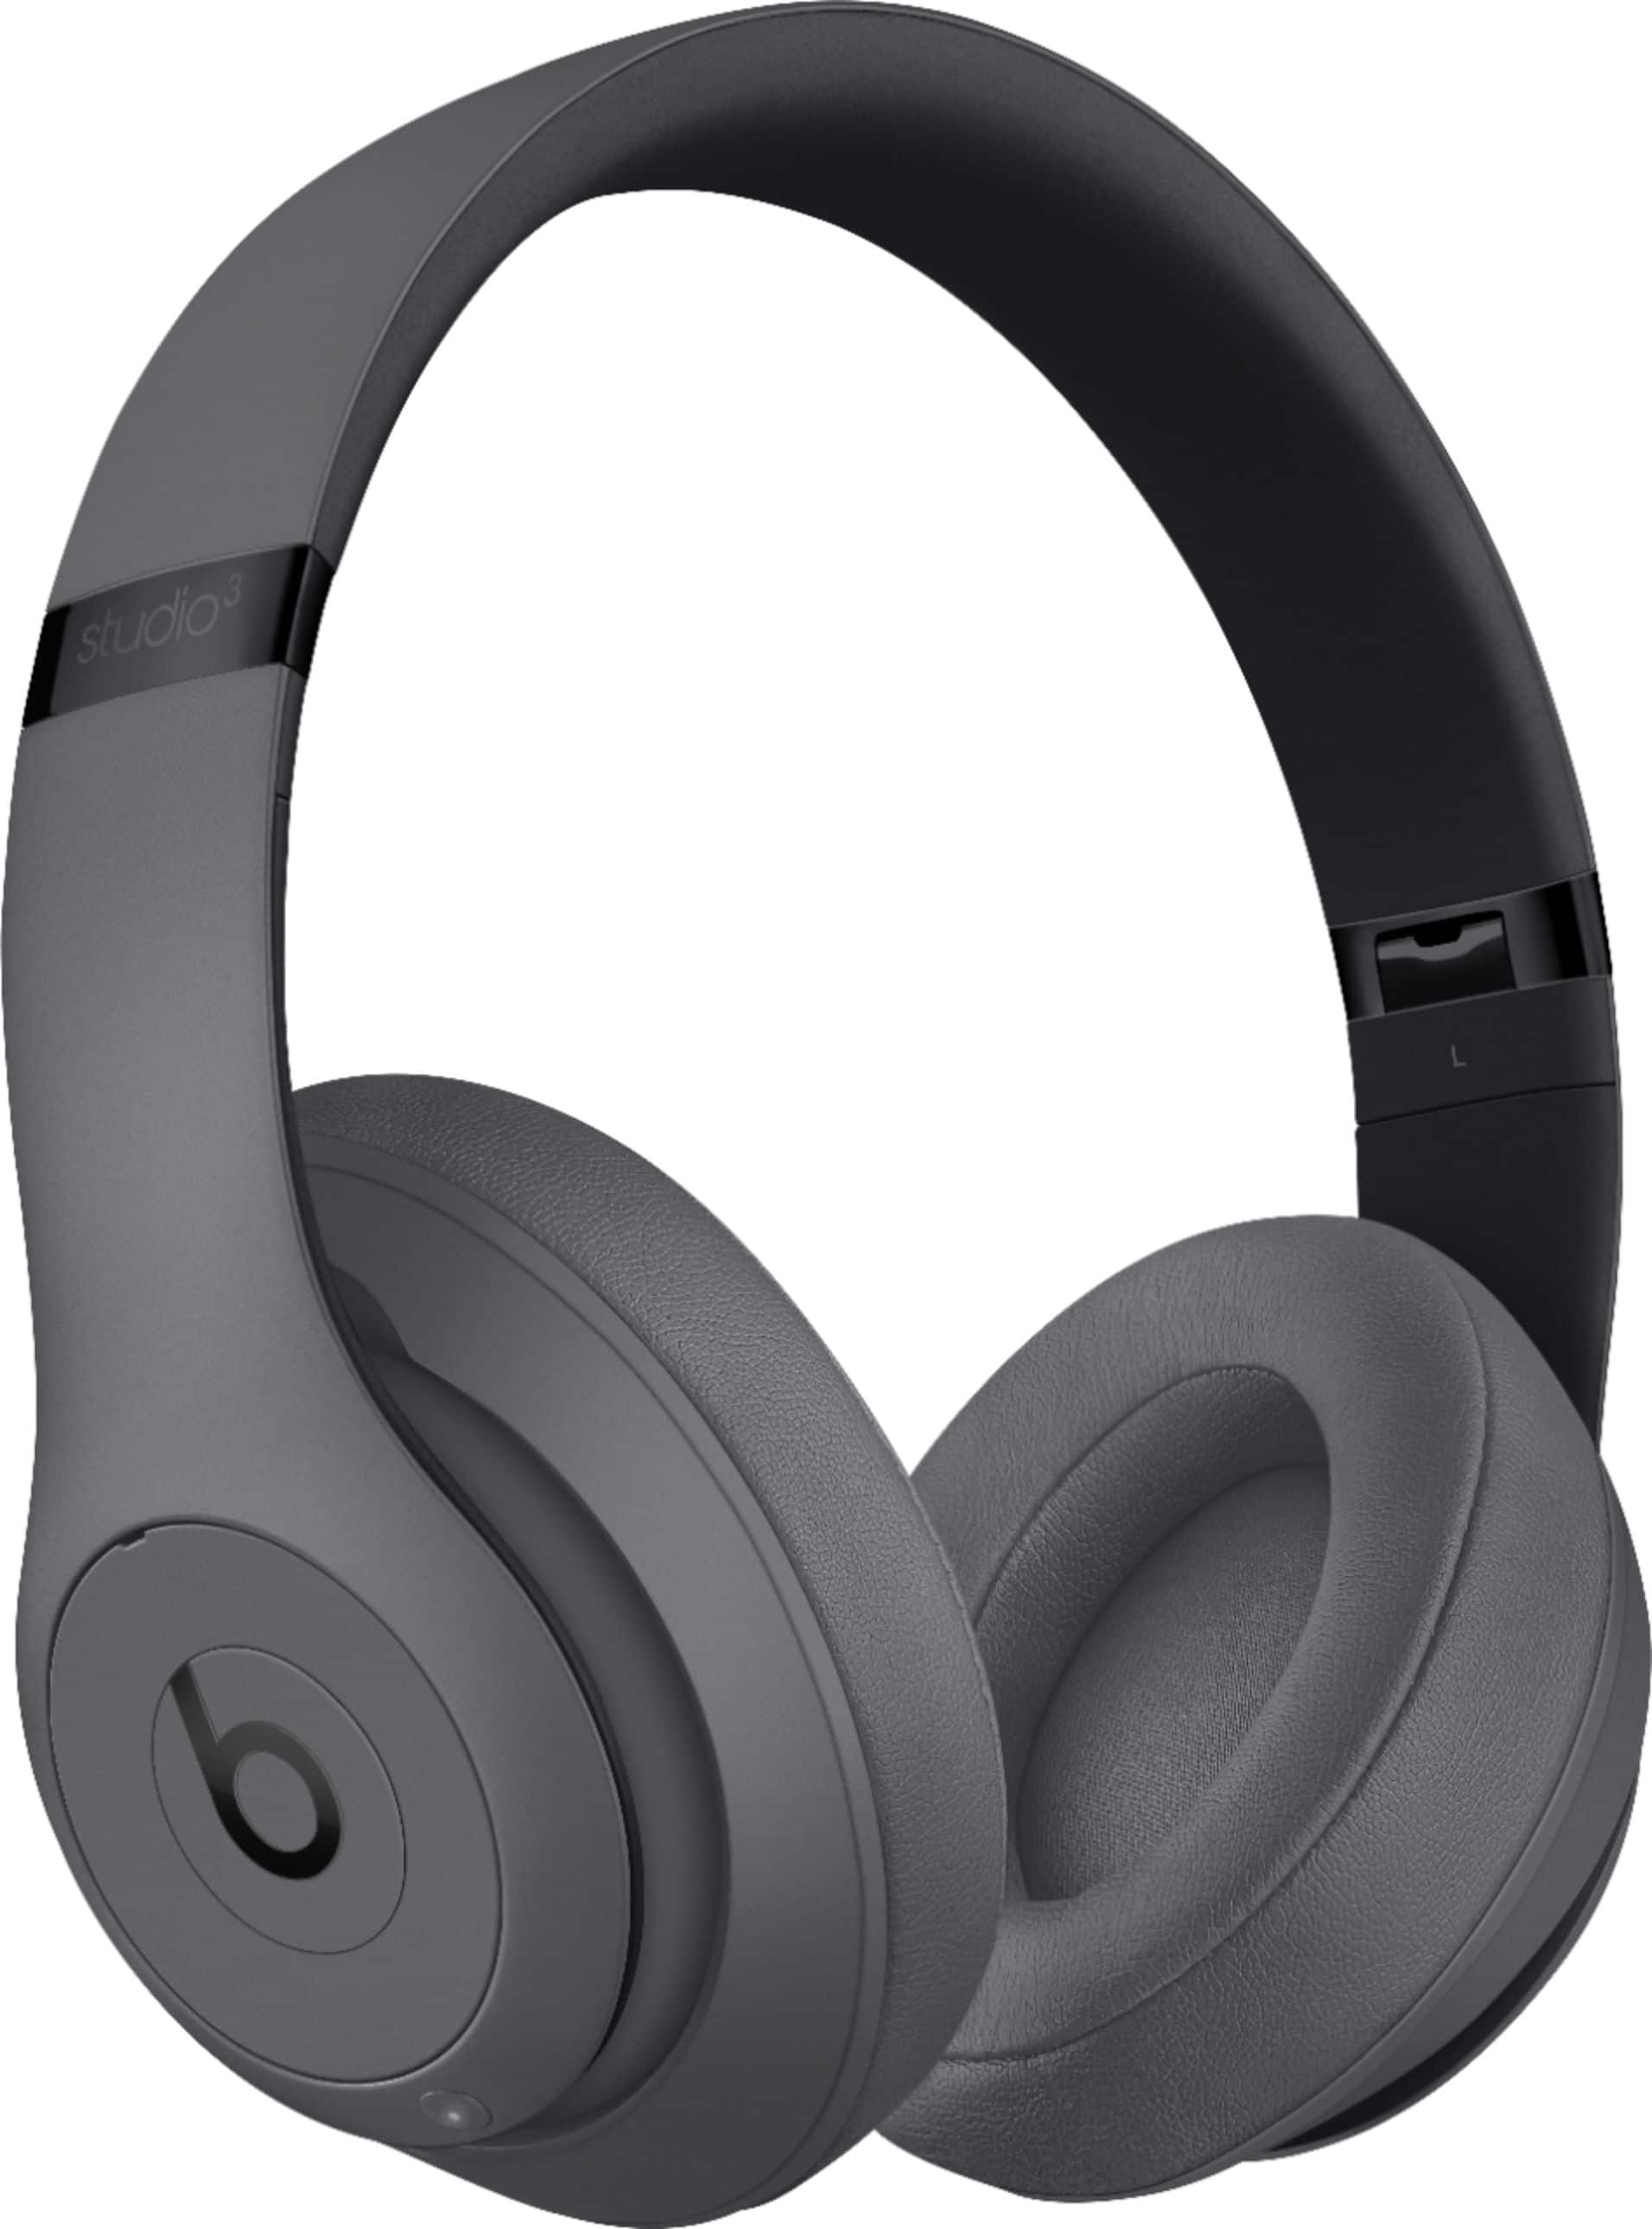 Beats by Dr. Dre - Beats Studio³ Wireless Noise Canceling Headphones - Gray & Desert Sand $199.99